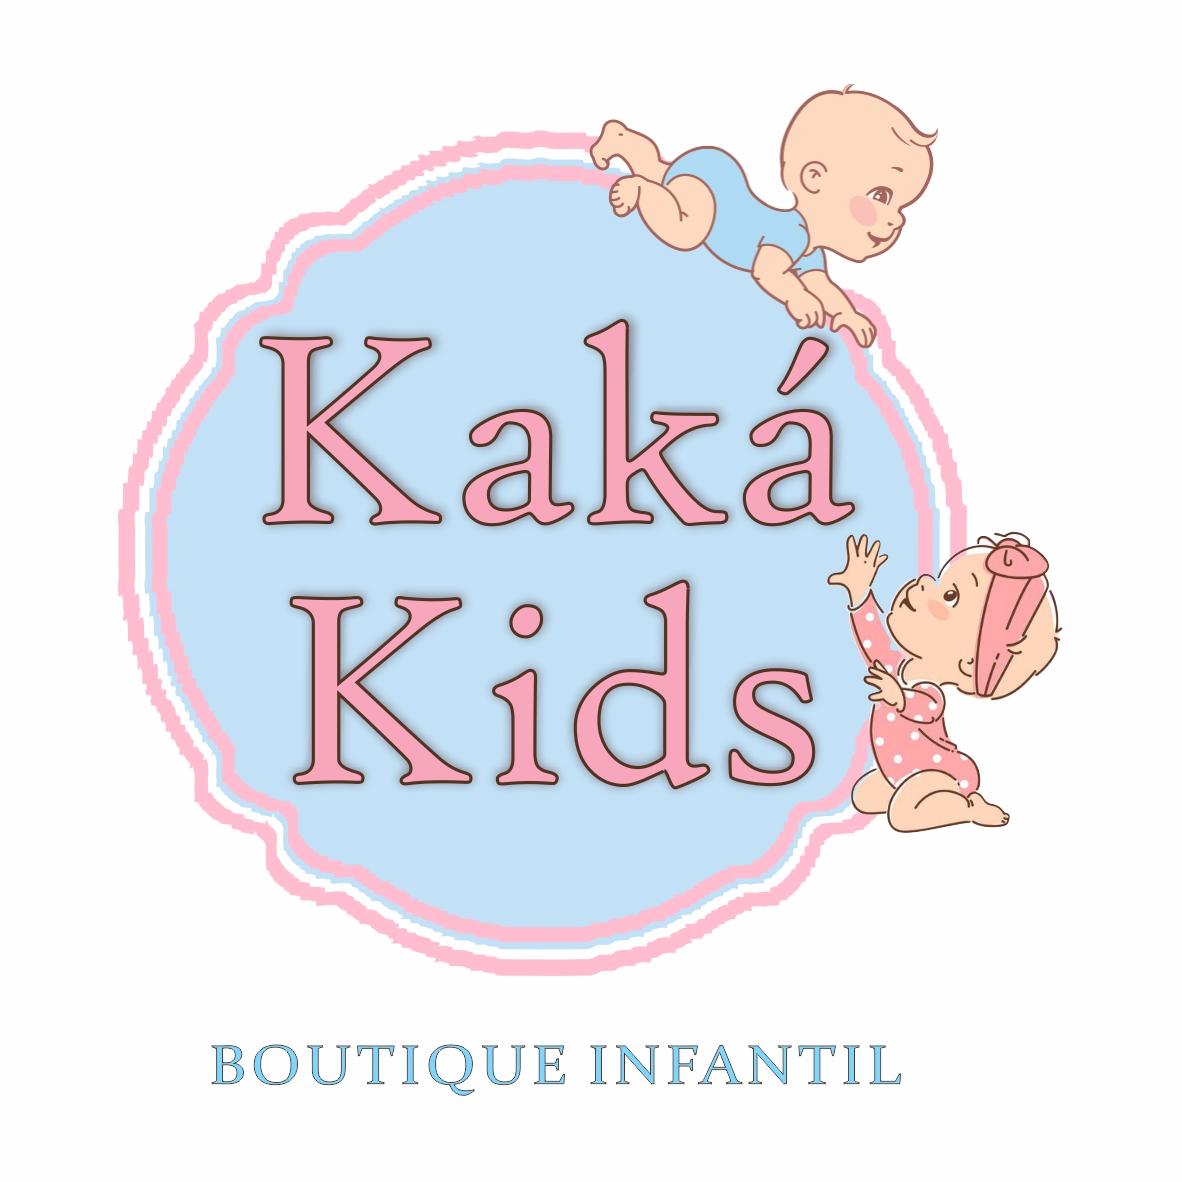 Kaka Kids - Perfil Boutique .JPG